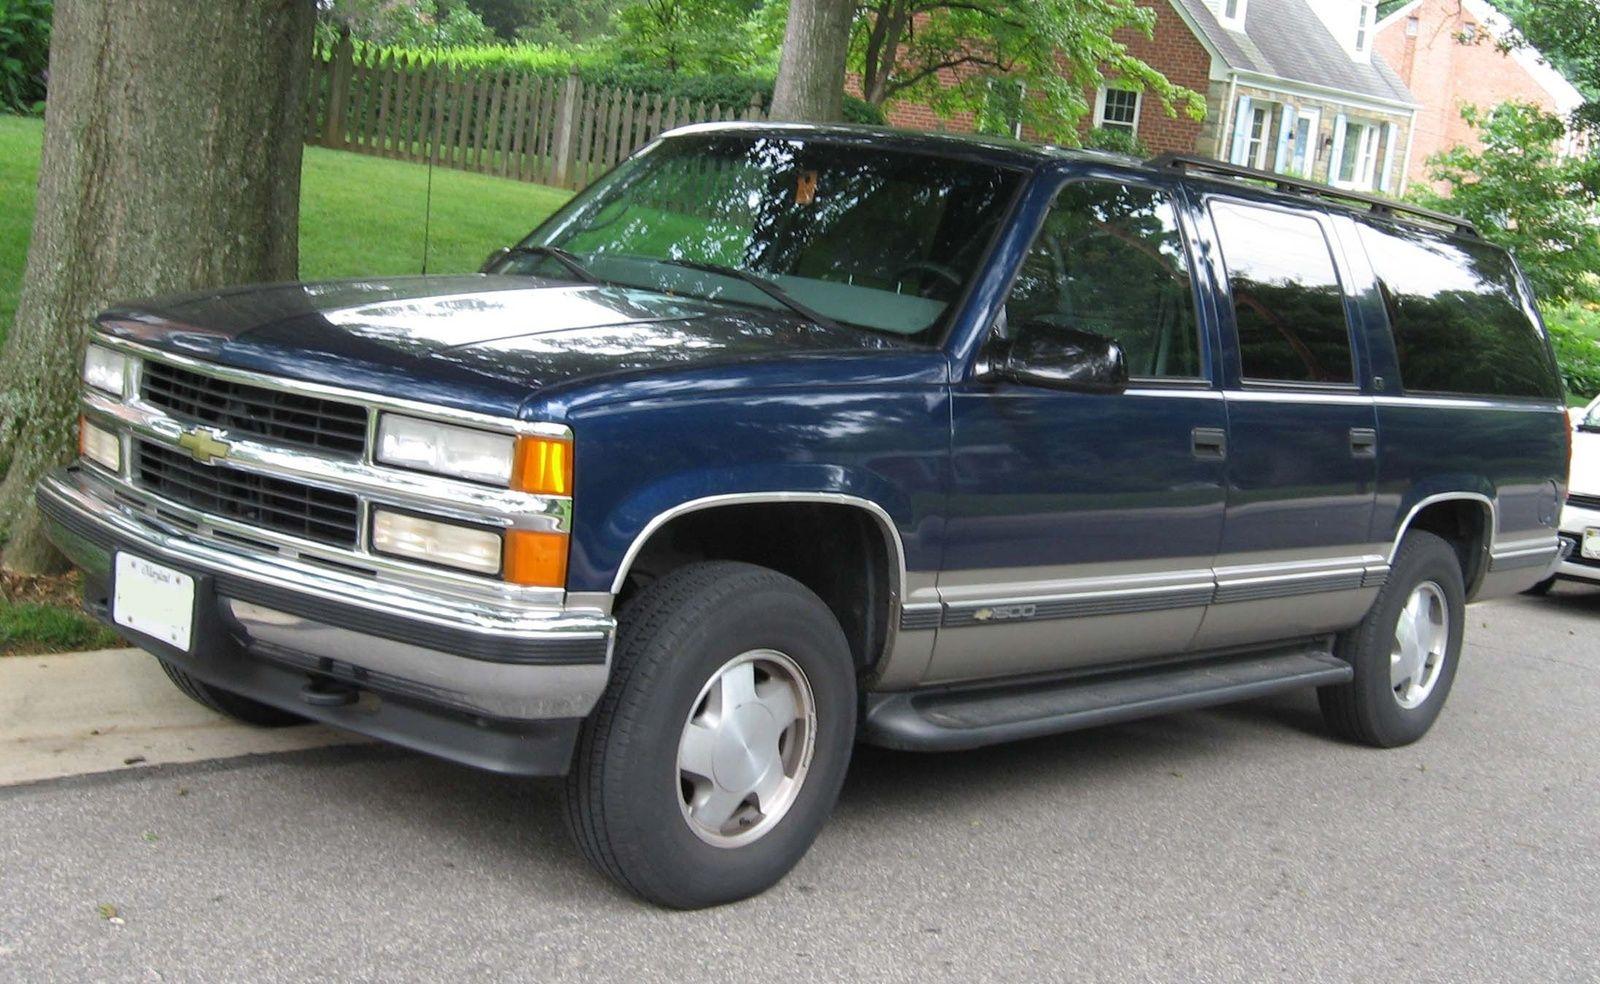 Best Used Chevy Models Under 10000 Car Tips Pinterest Fuel Filter 1994 Gmc Truck Dealerships Cars